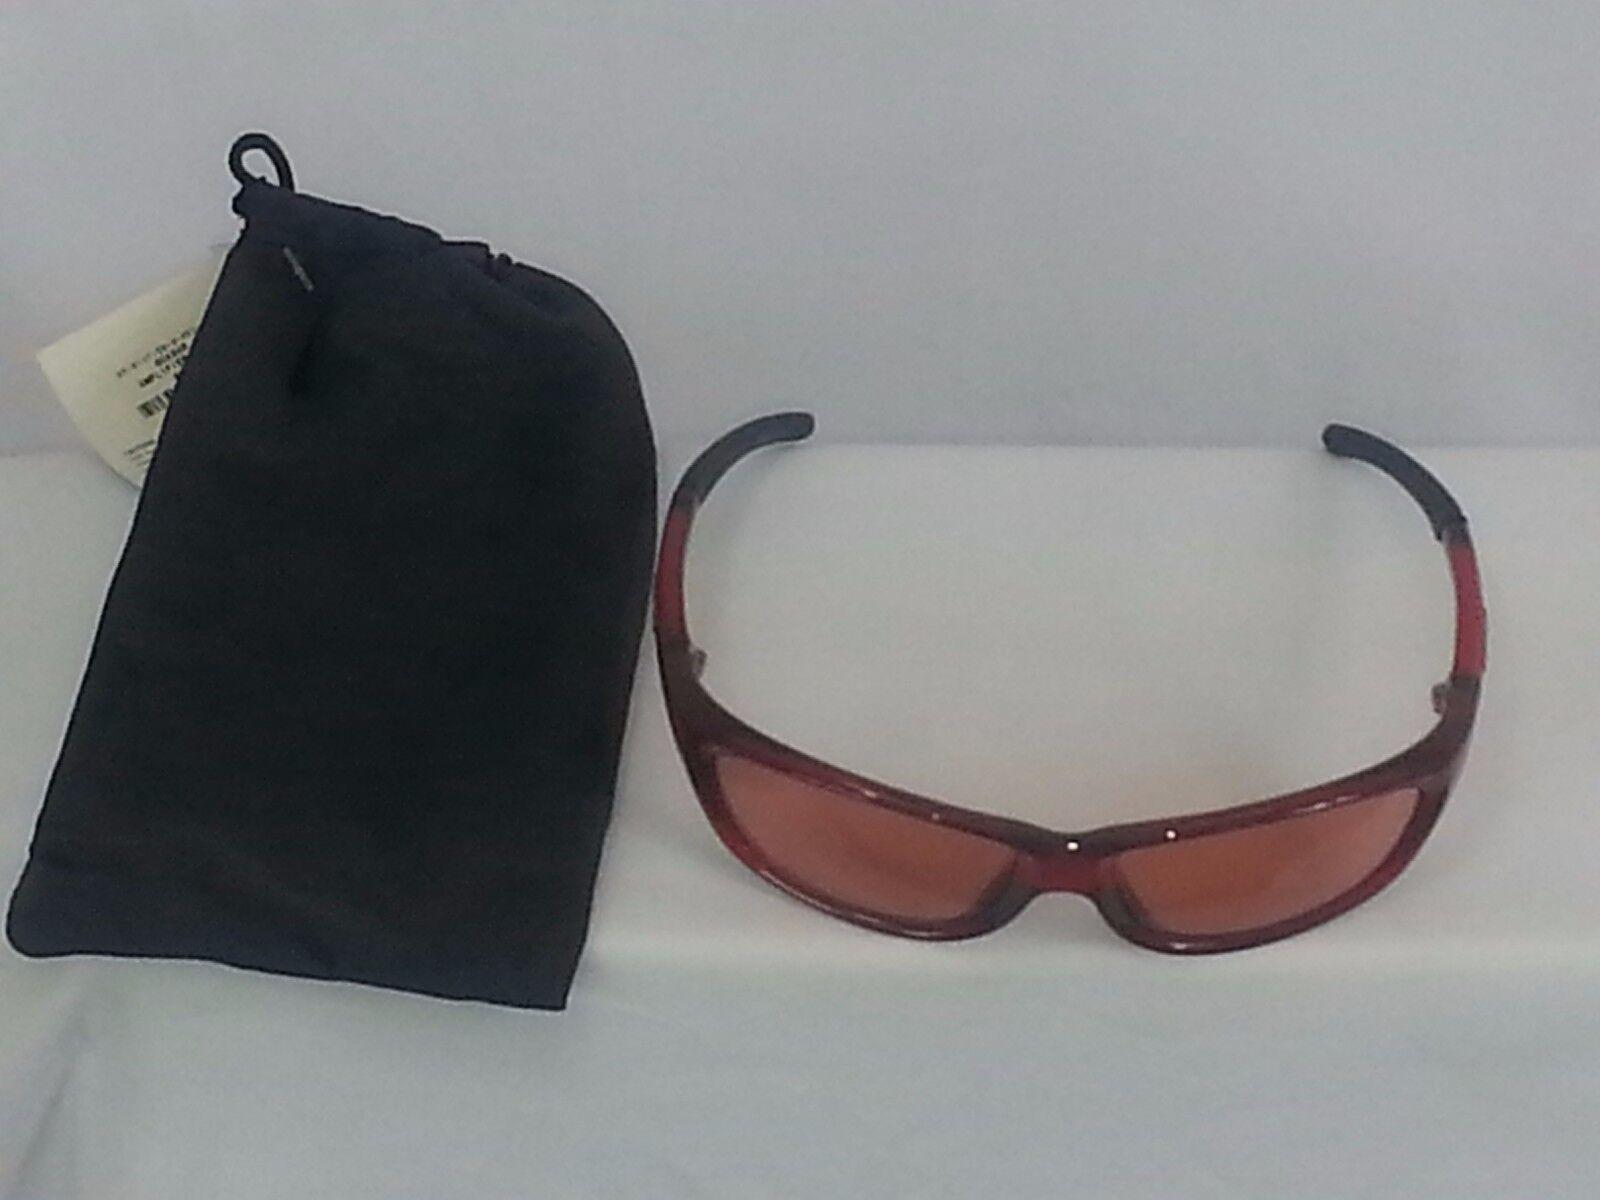 SCOTT, Sunglasses, Quasar, Red Amplifier Lens, 100% Ultrapurple Predection